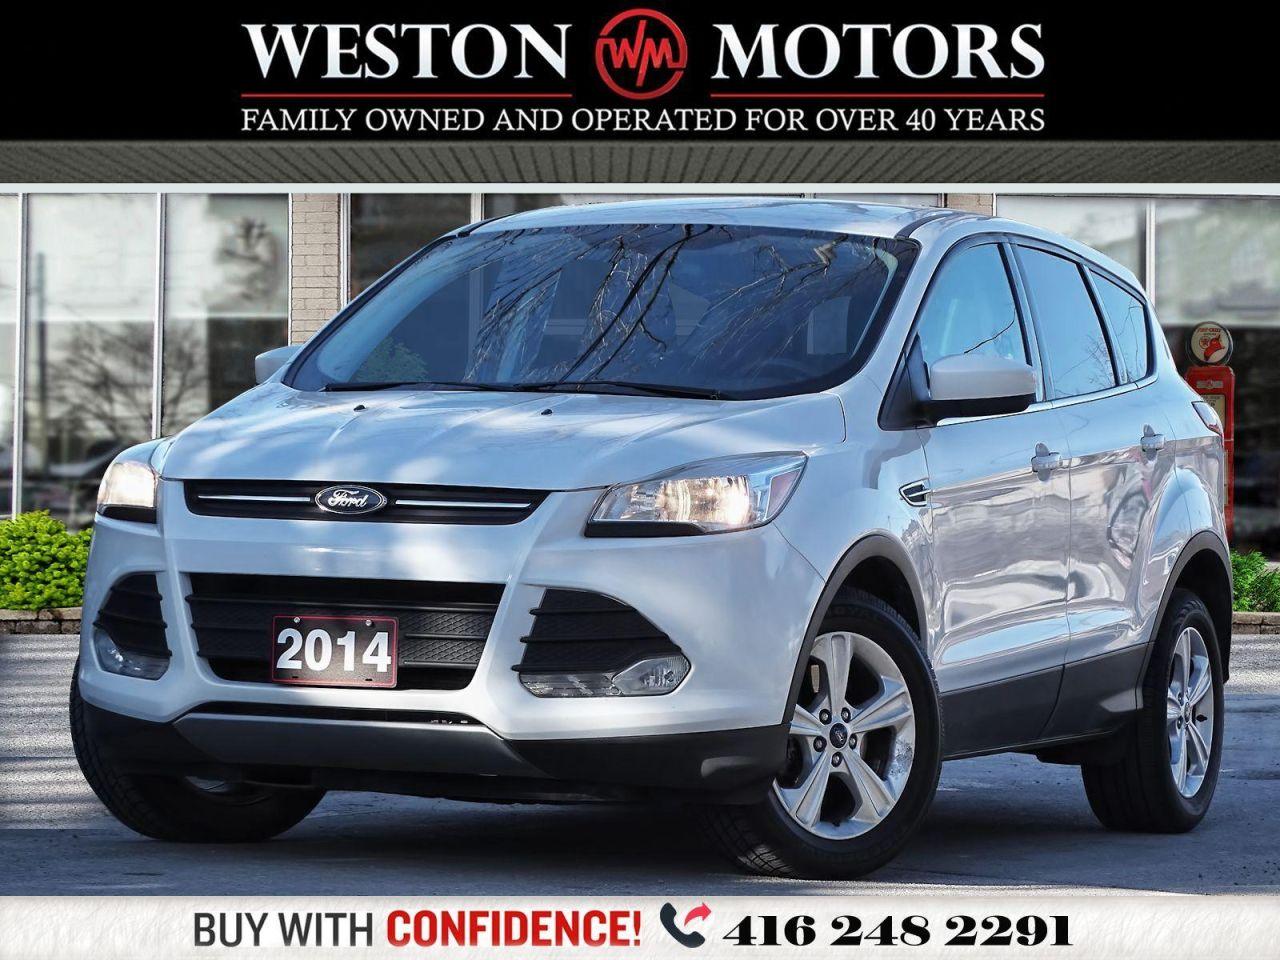 2014 Ford Escape SE*2.0L*AWD*REVERSE CAMERA*HEATED SEATS